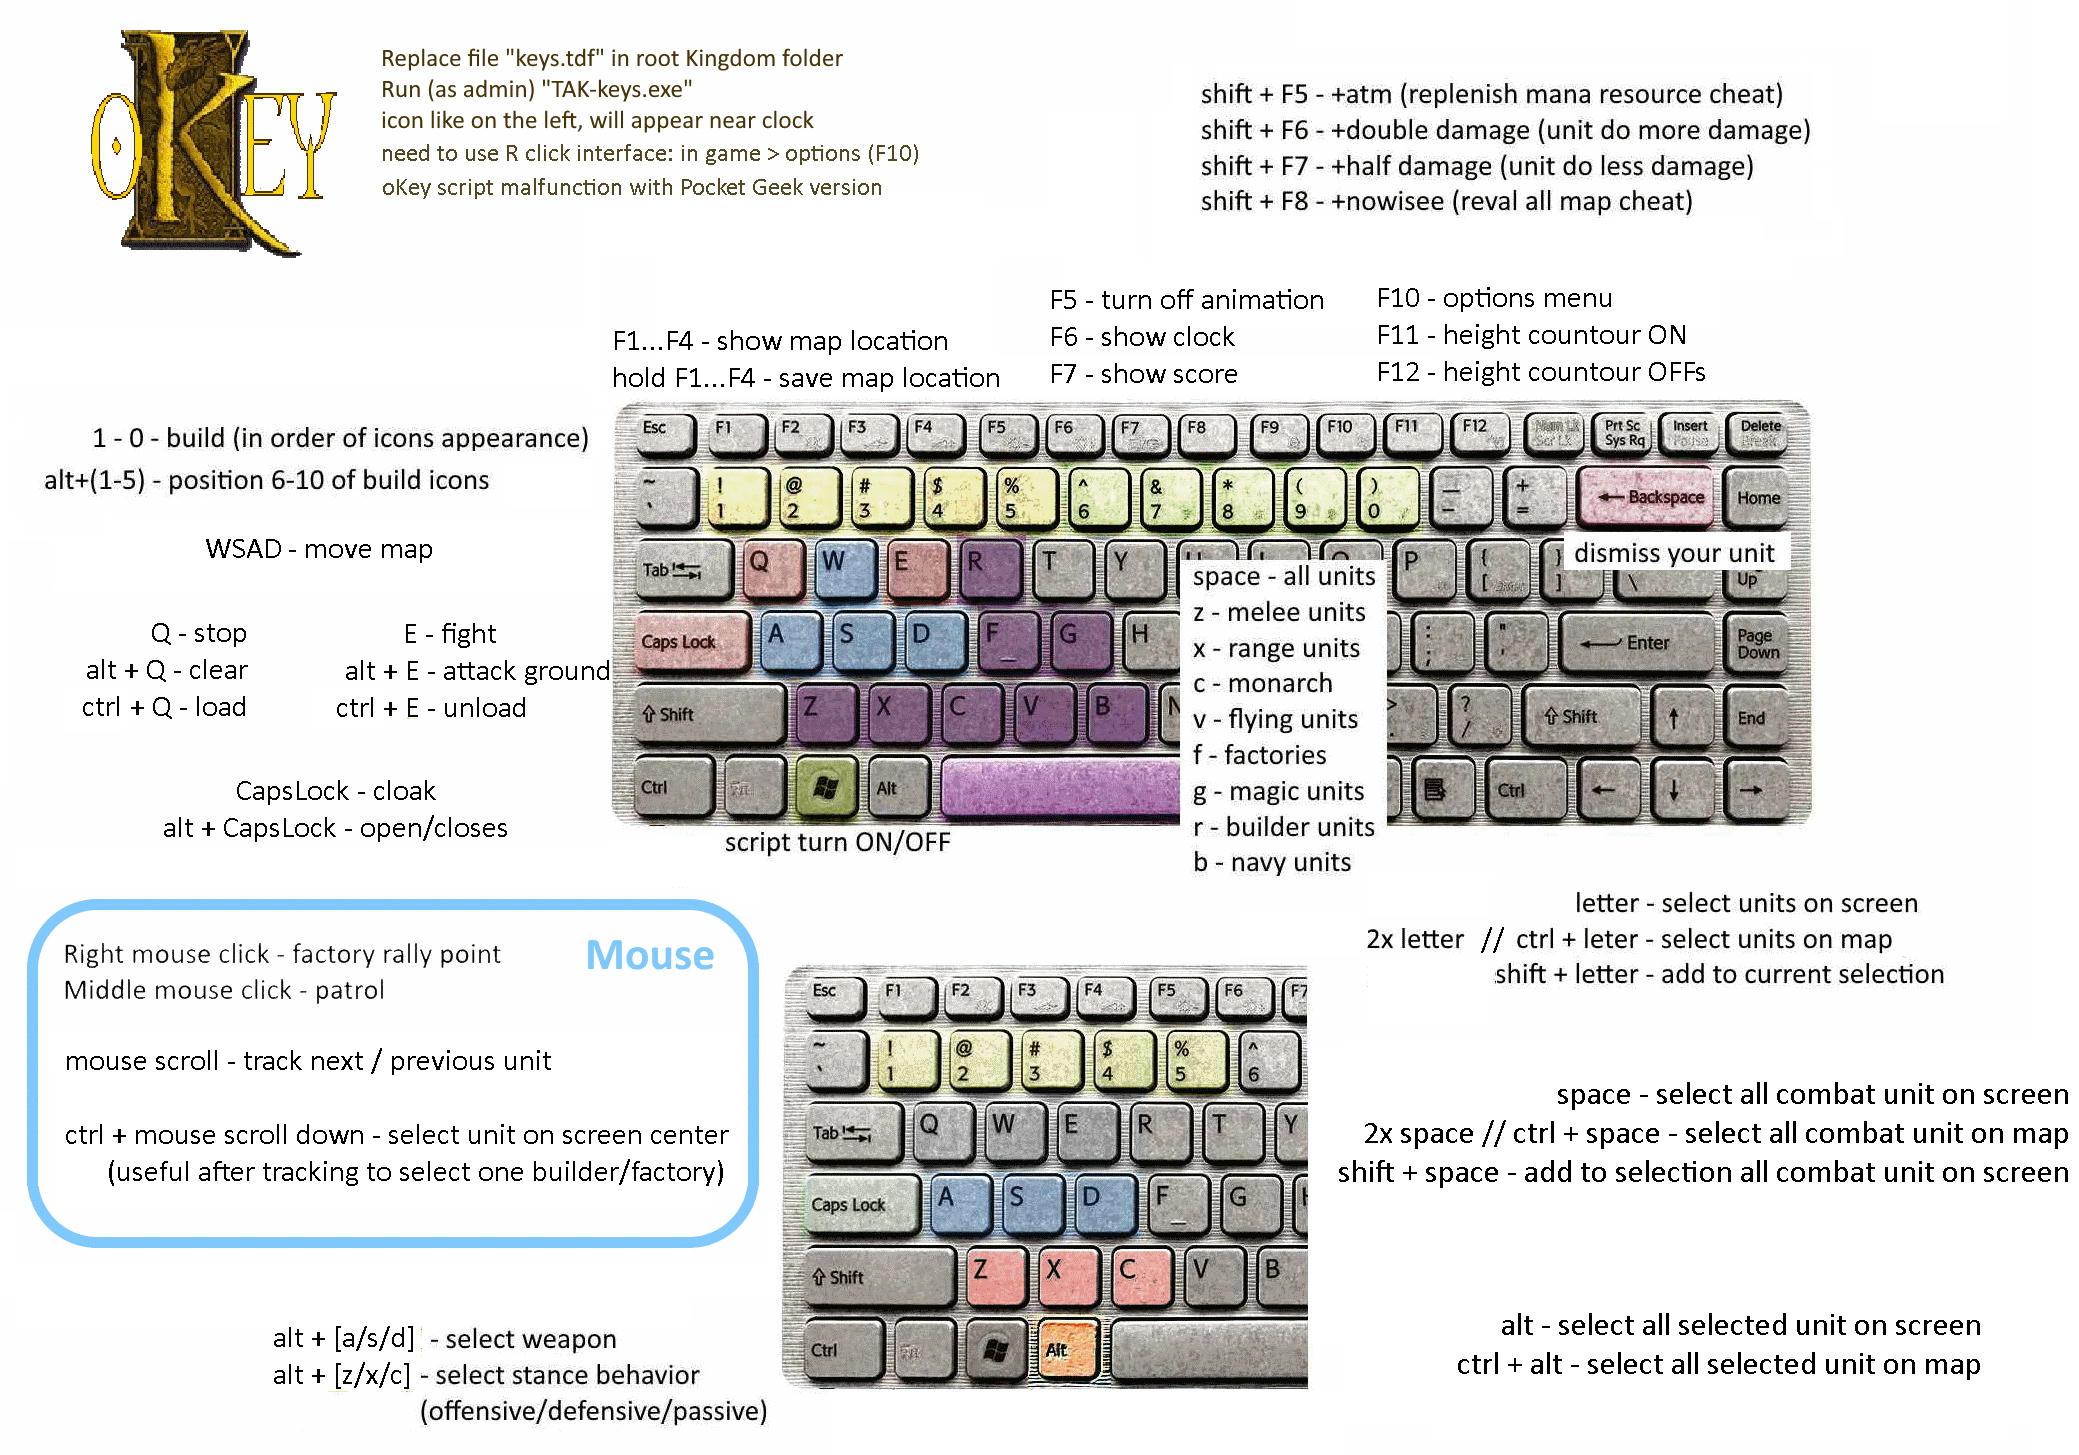 Alternative key setup for TAK Qyo1hczc1qgtlbazg